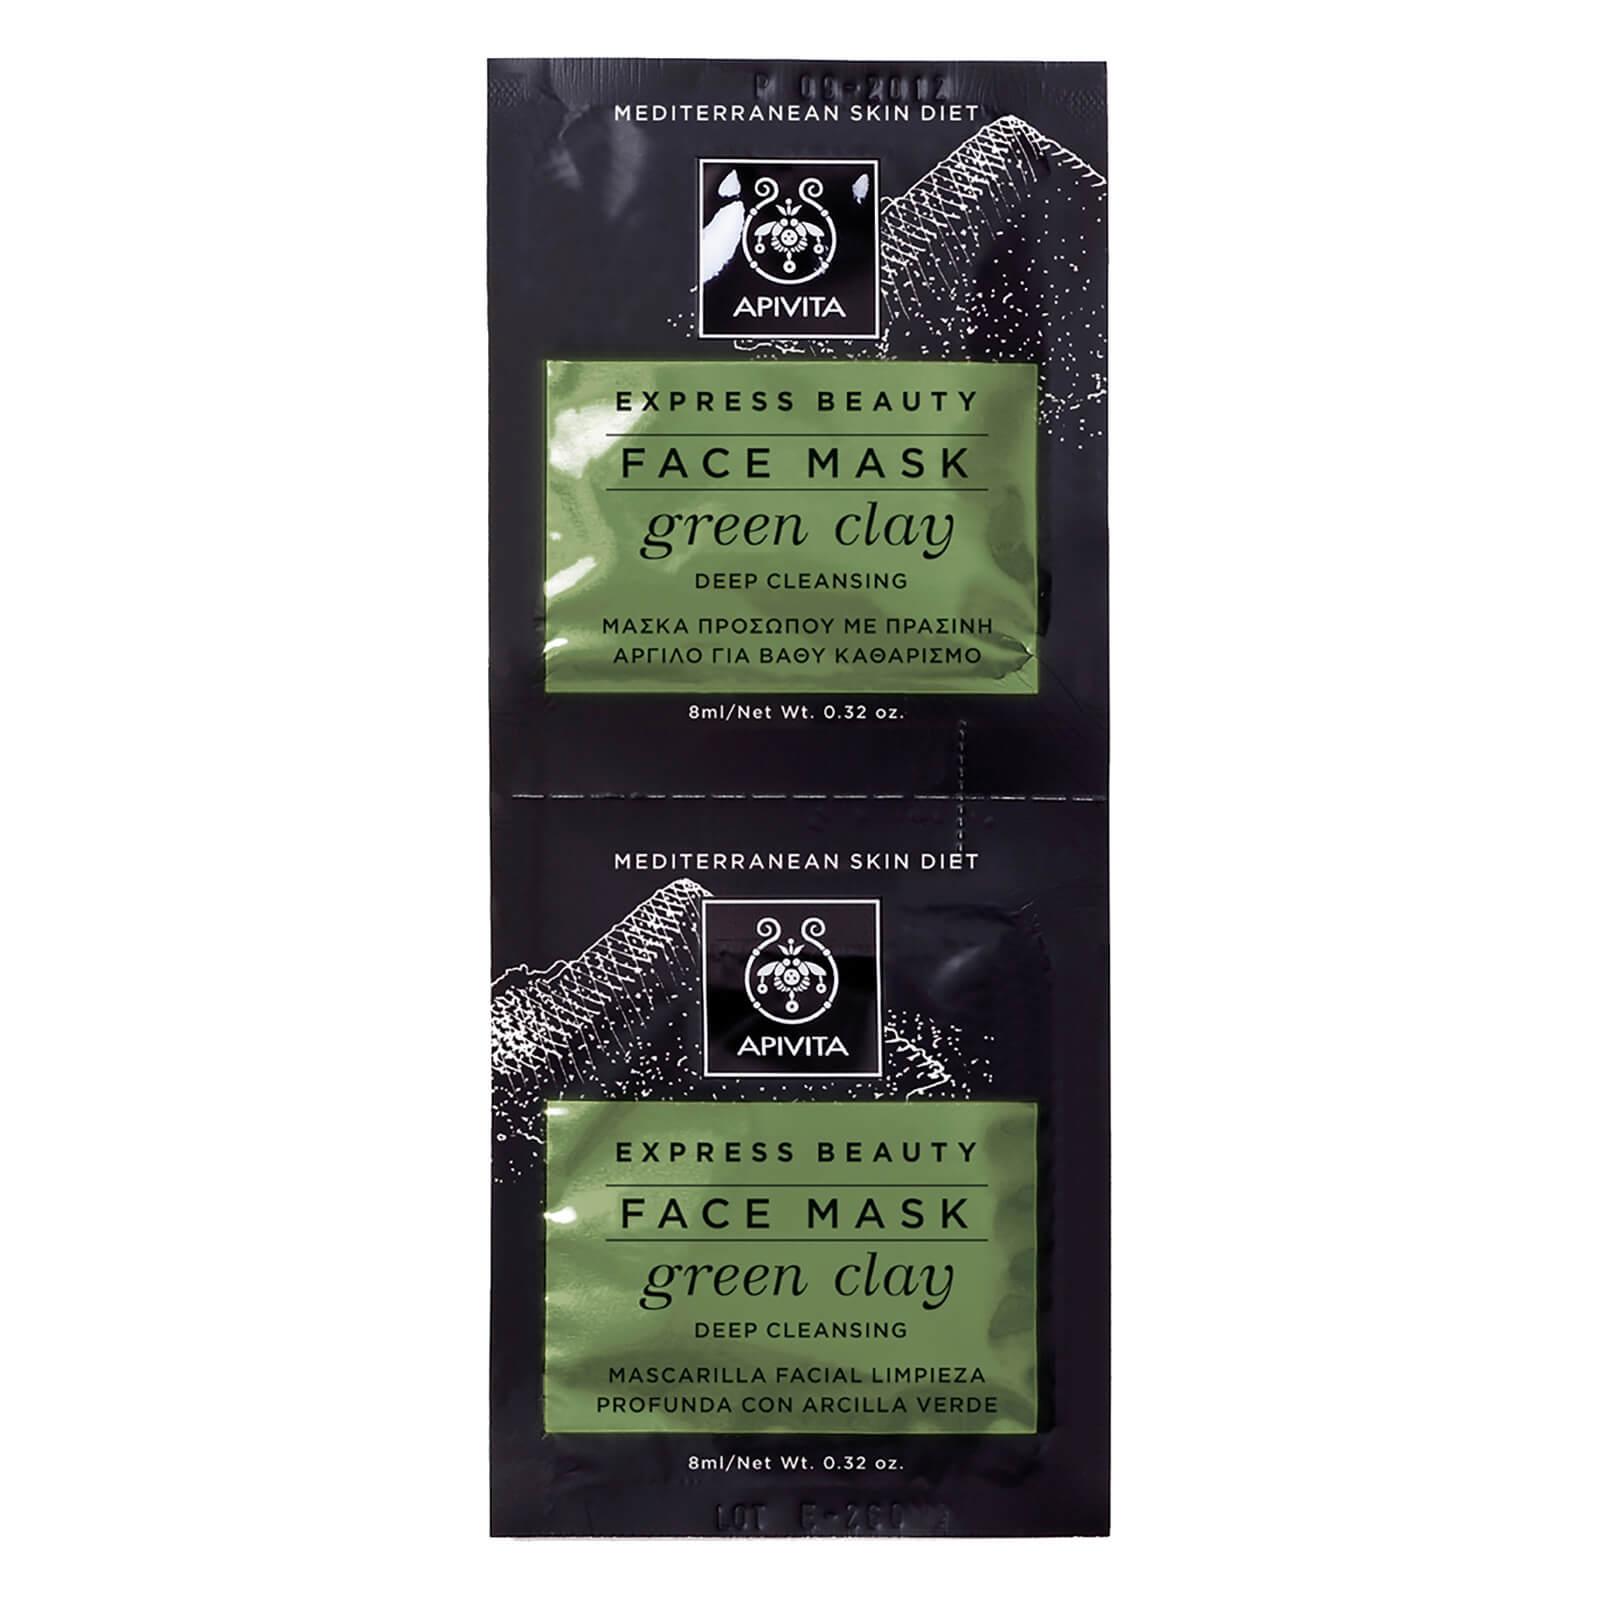 APIVITA Express Deep Cleansing Face Mask - Green Clay 2x8ml